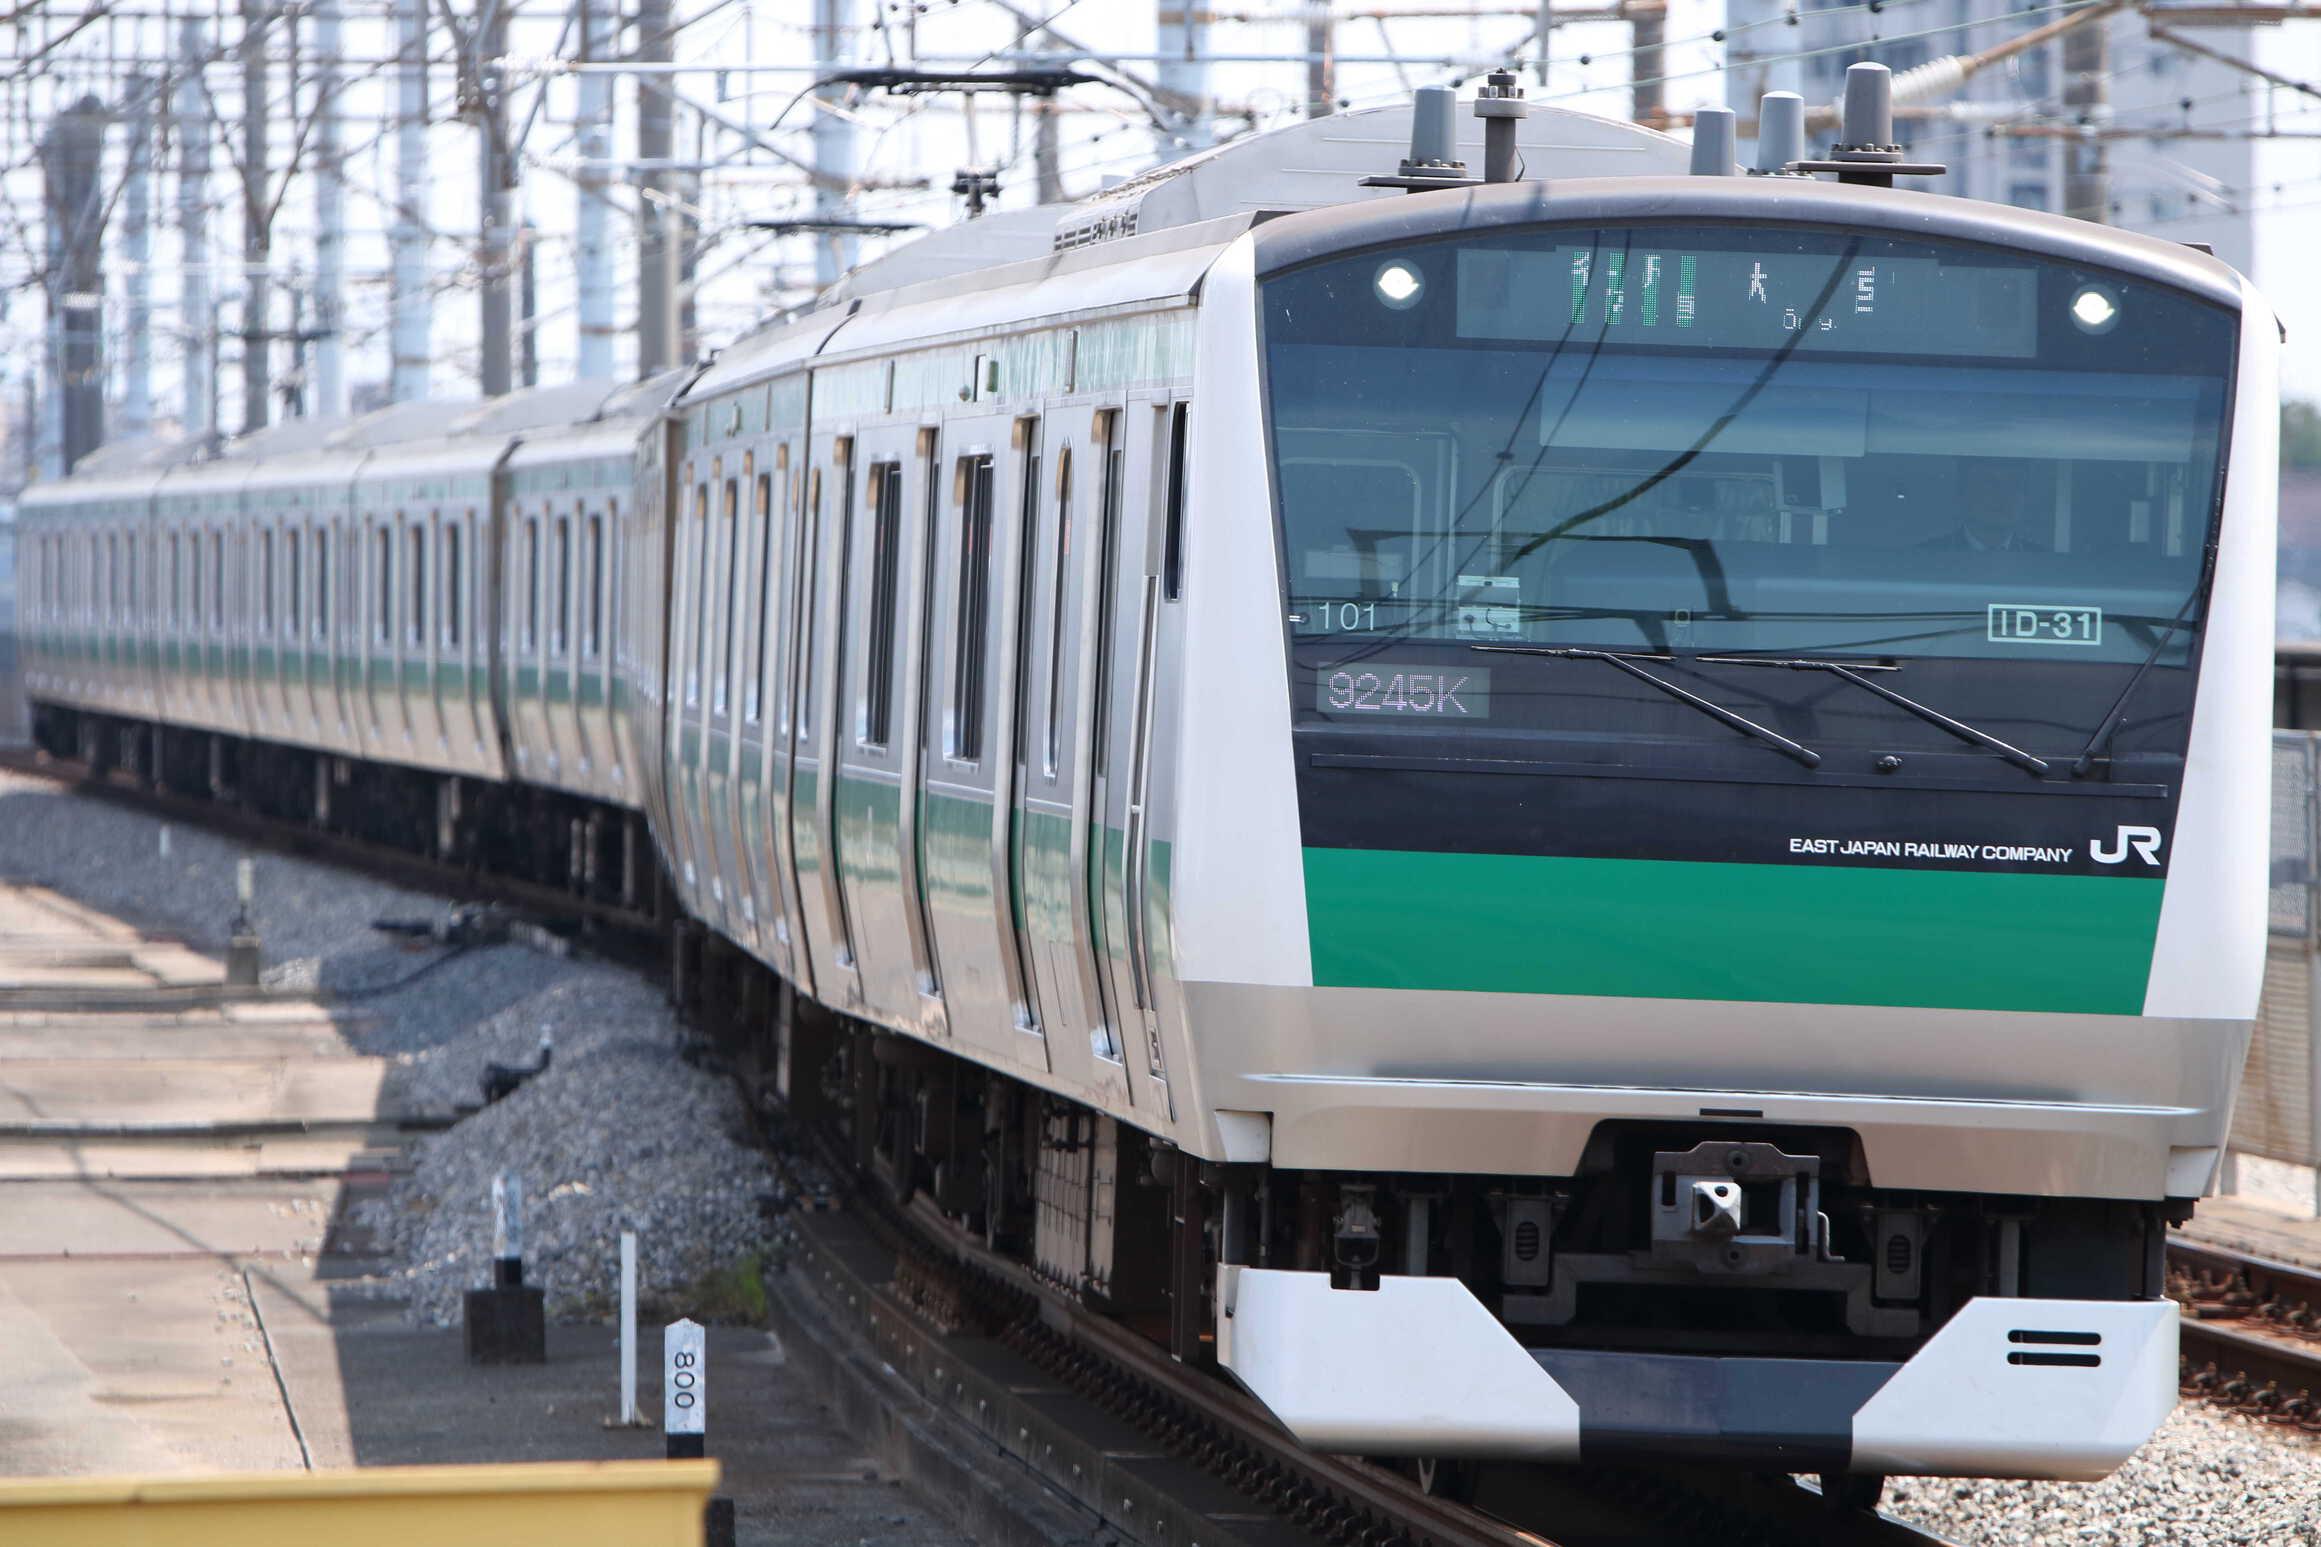 9245K(シク〜オオ) 渋谷駅線路切り替え工事に伴う臨時列車 E233系 宮ハエ101編成